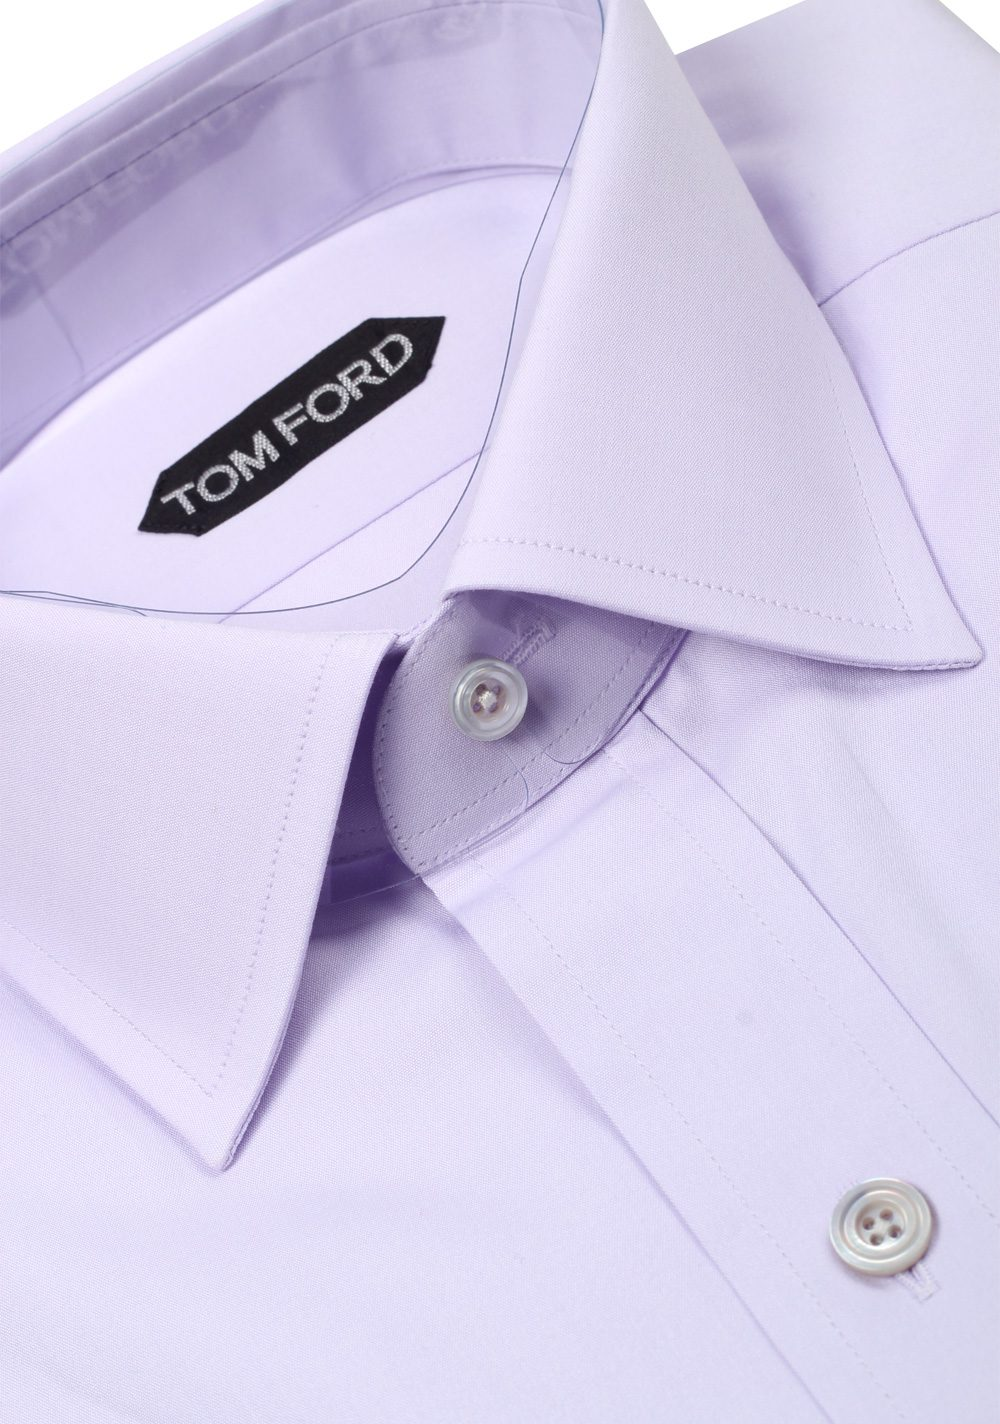 d03025eae933 TOM FORD Solid Lilac Dress Shirt Size 38 / 15 U.S. Slim Fit   Costume Limité